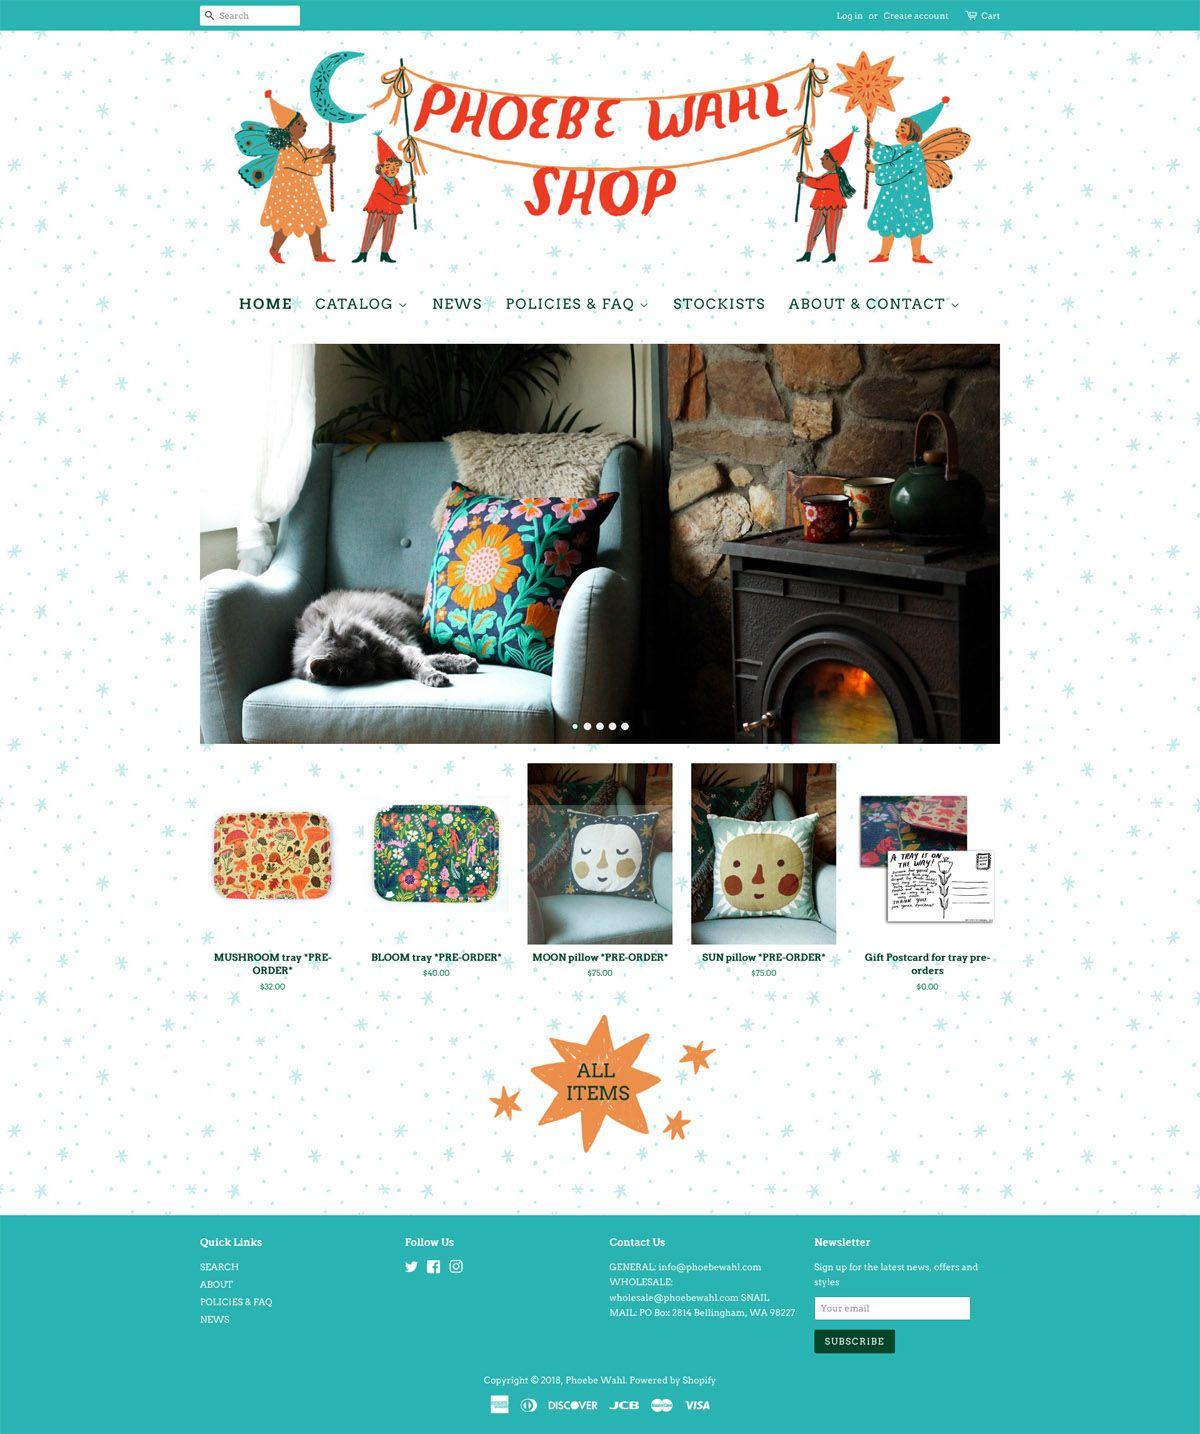 eCommerce website: Phoebe Wahl